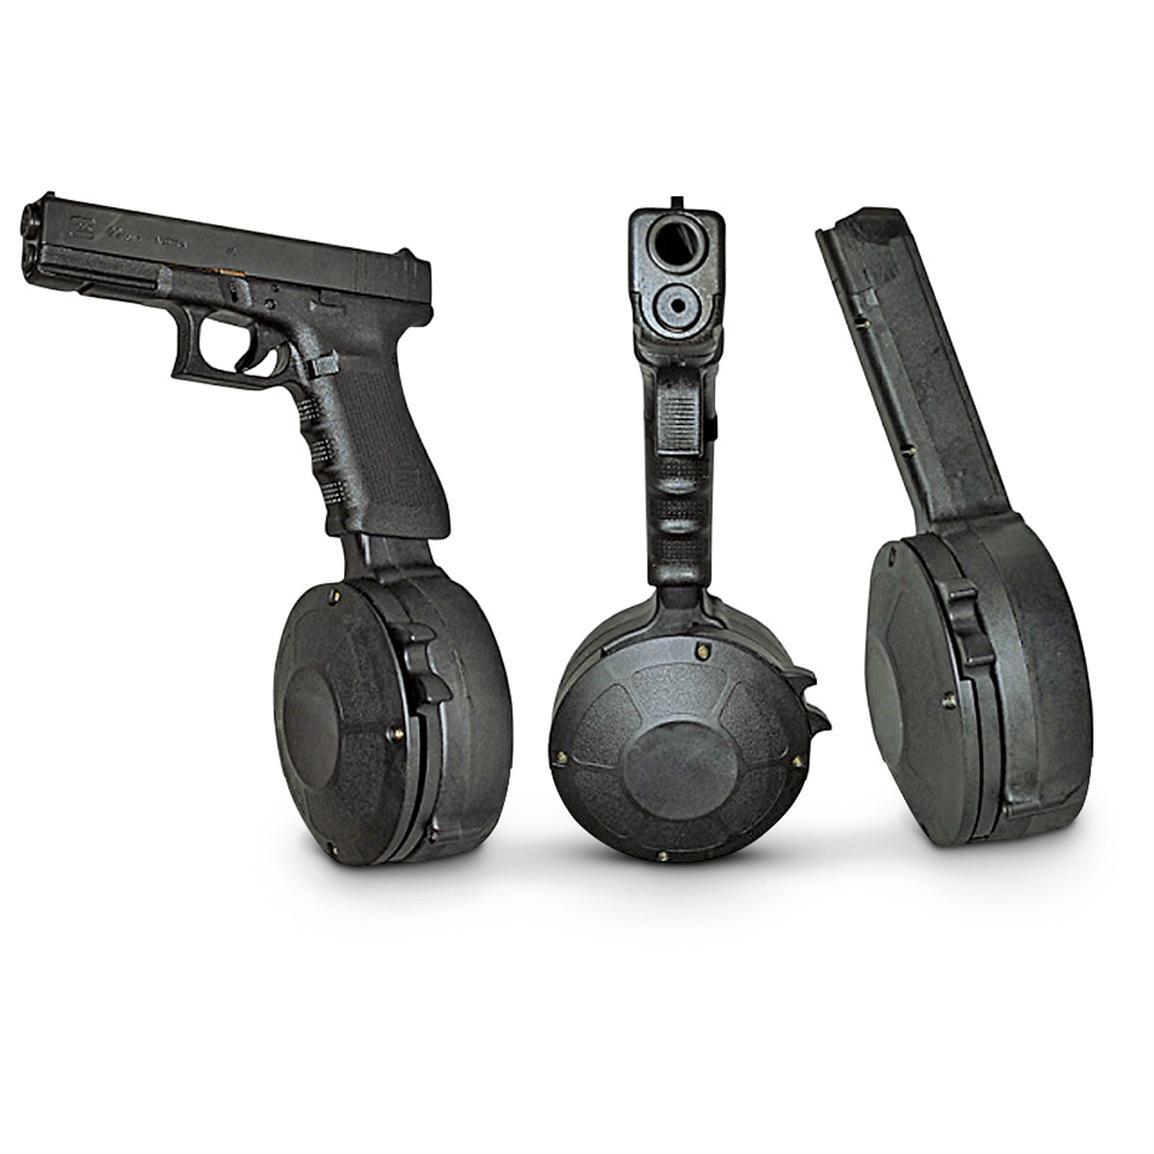 Glock 33 rd 9mm mags - how tall?-23220358-0222-4771-8b34-a749069ee8d7.jpeg